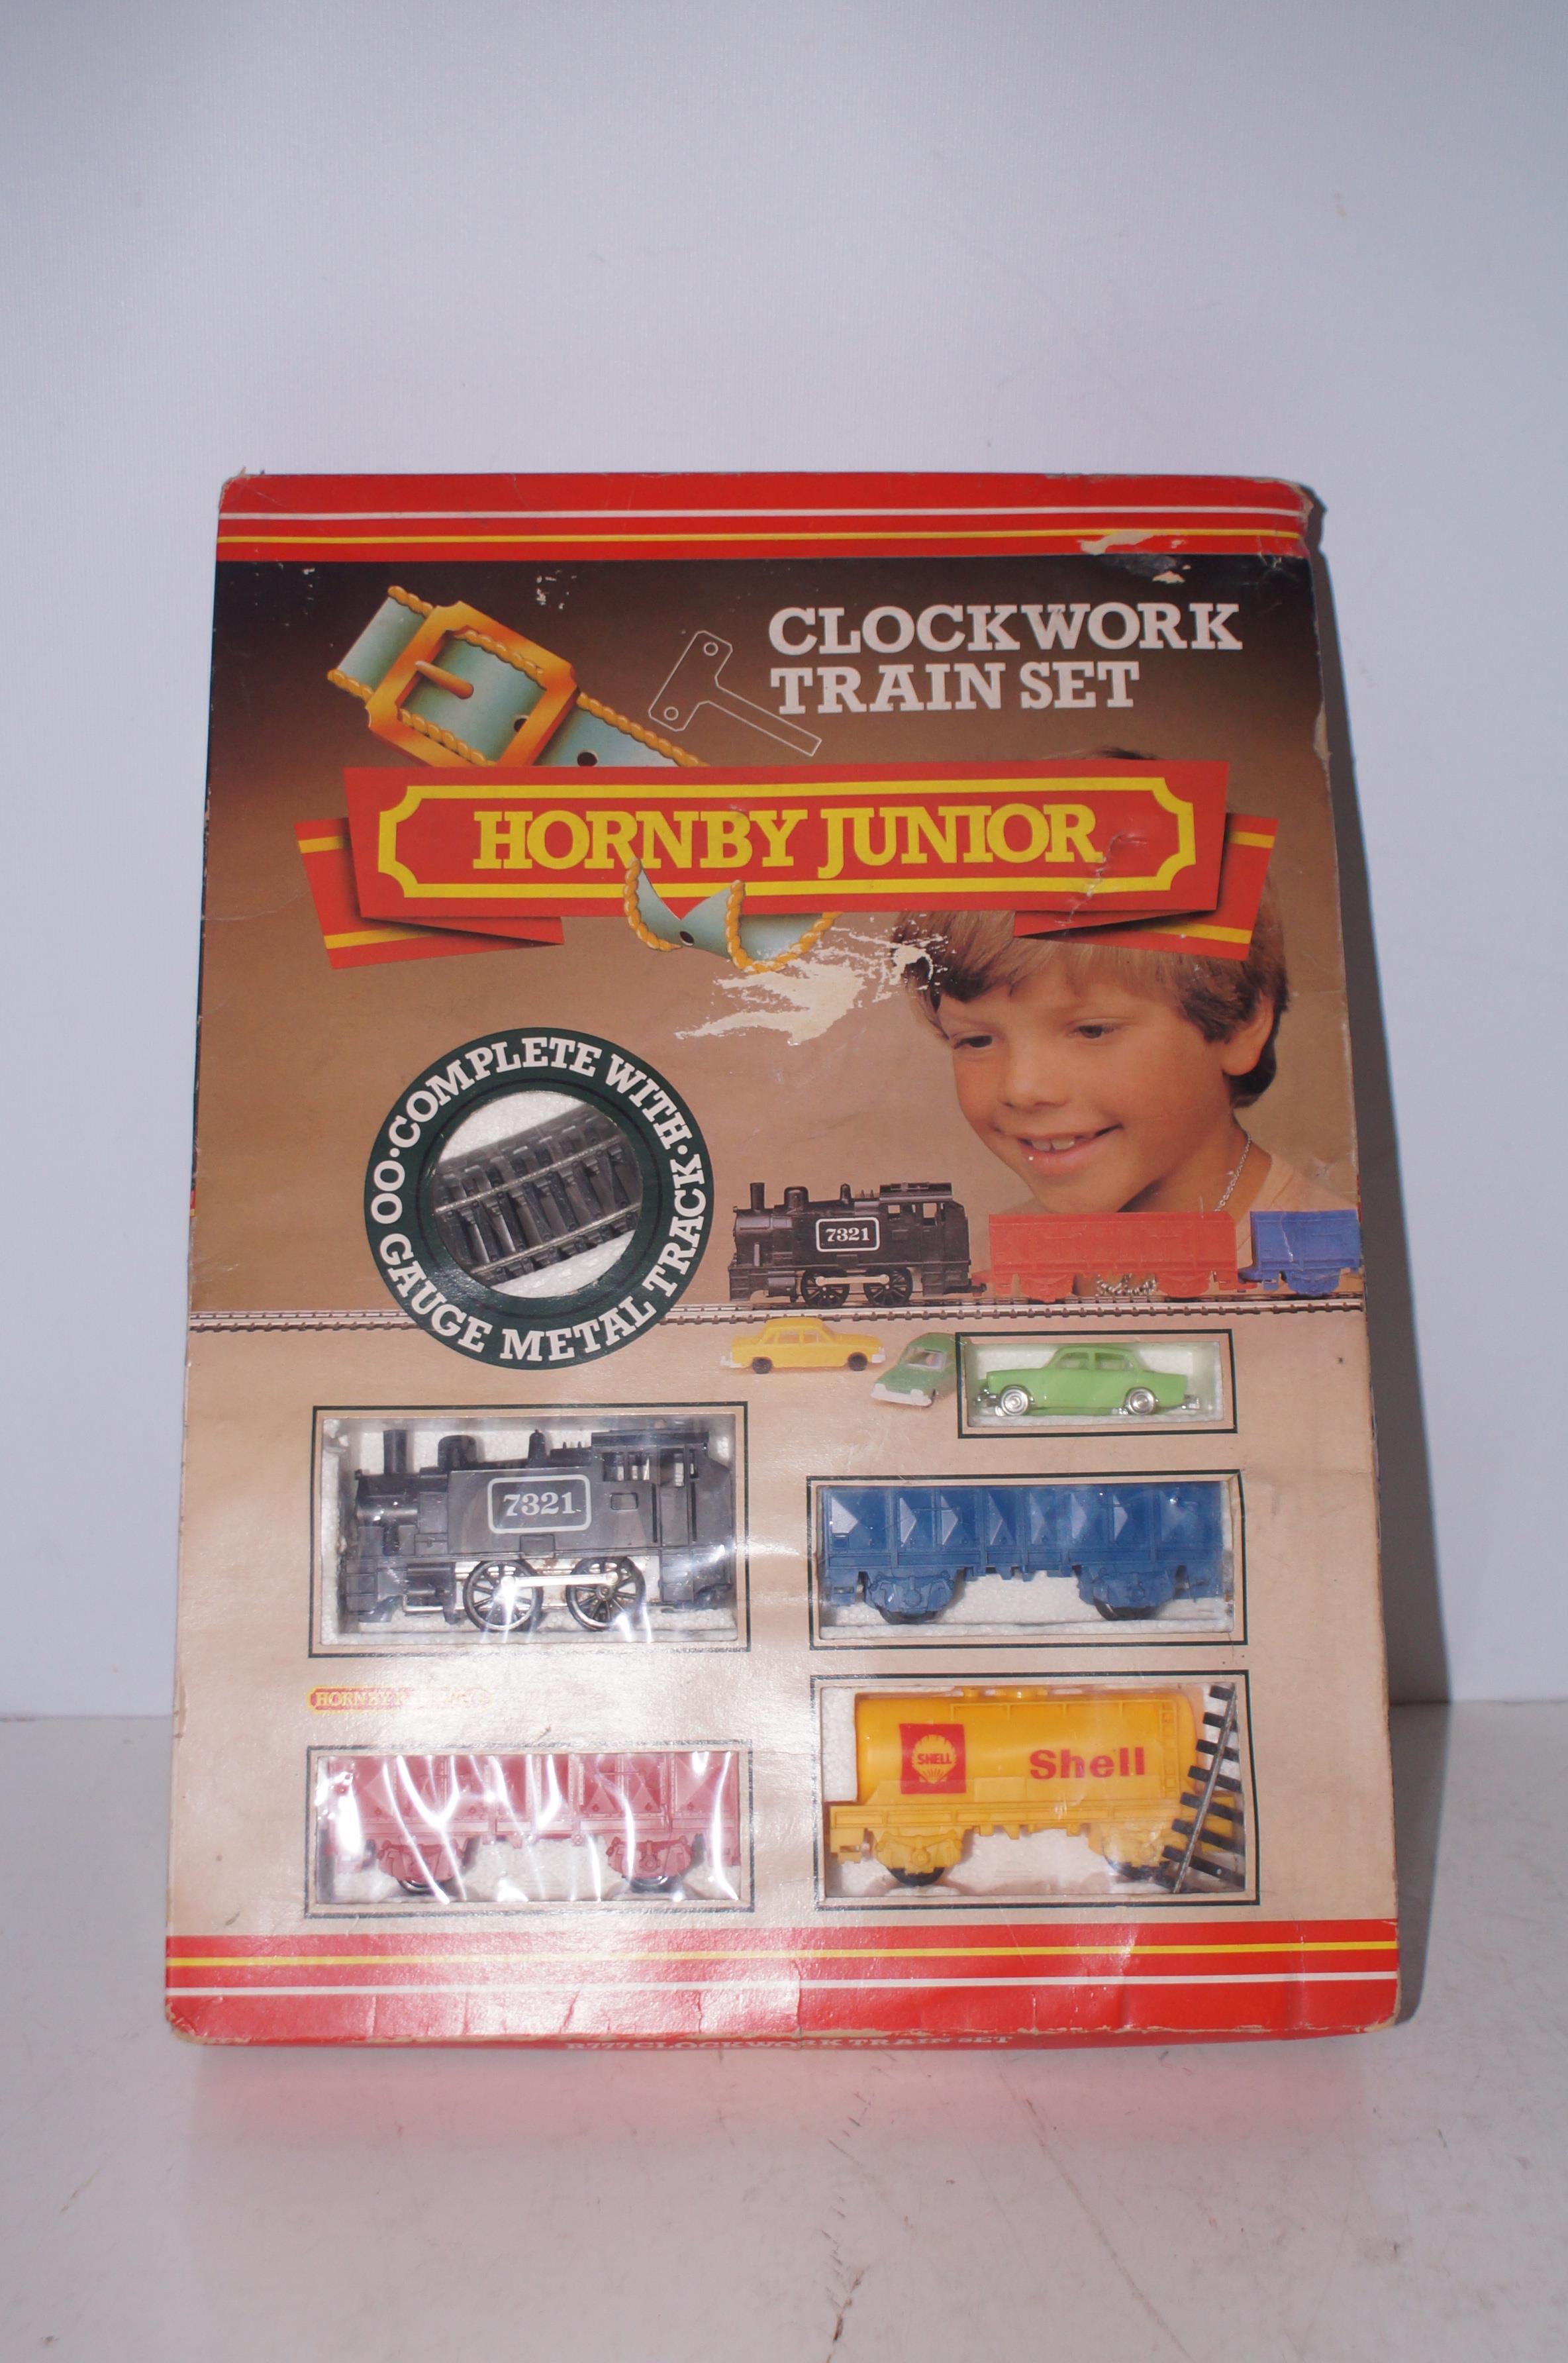 A Hornby junior trainset